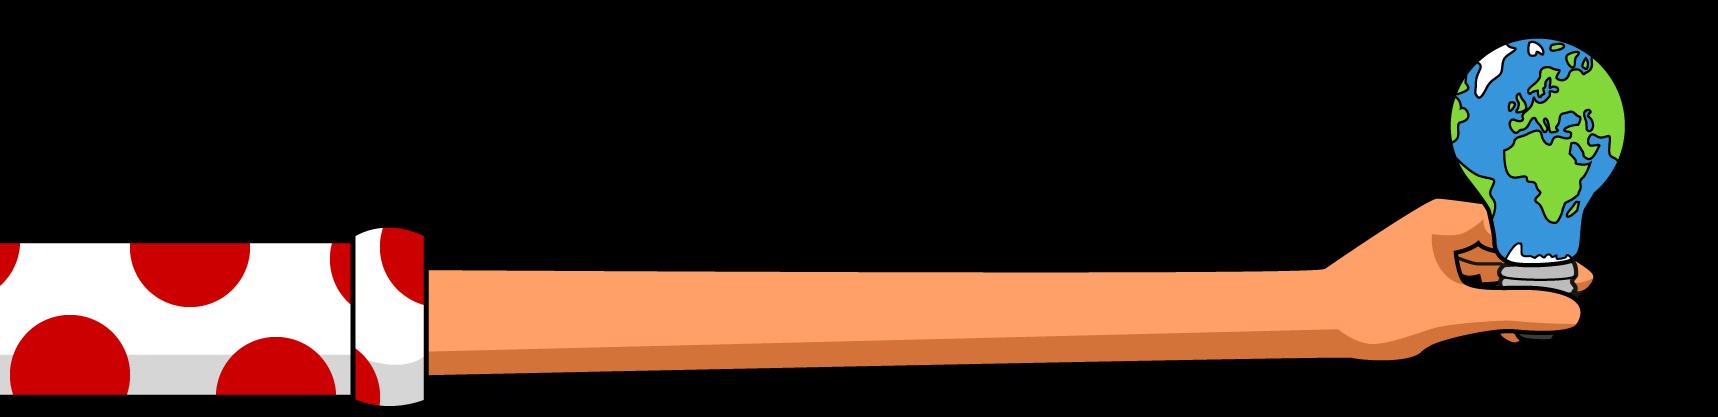 Pepeenergy, la compañía eléctrica de Pepephone